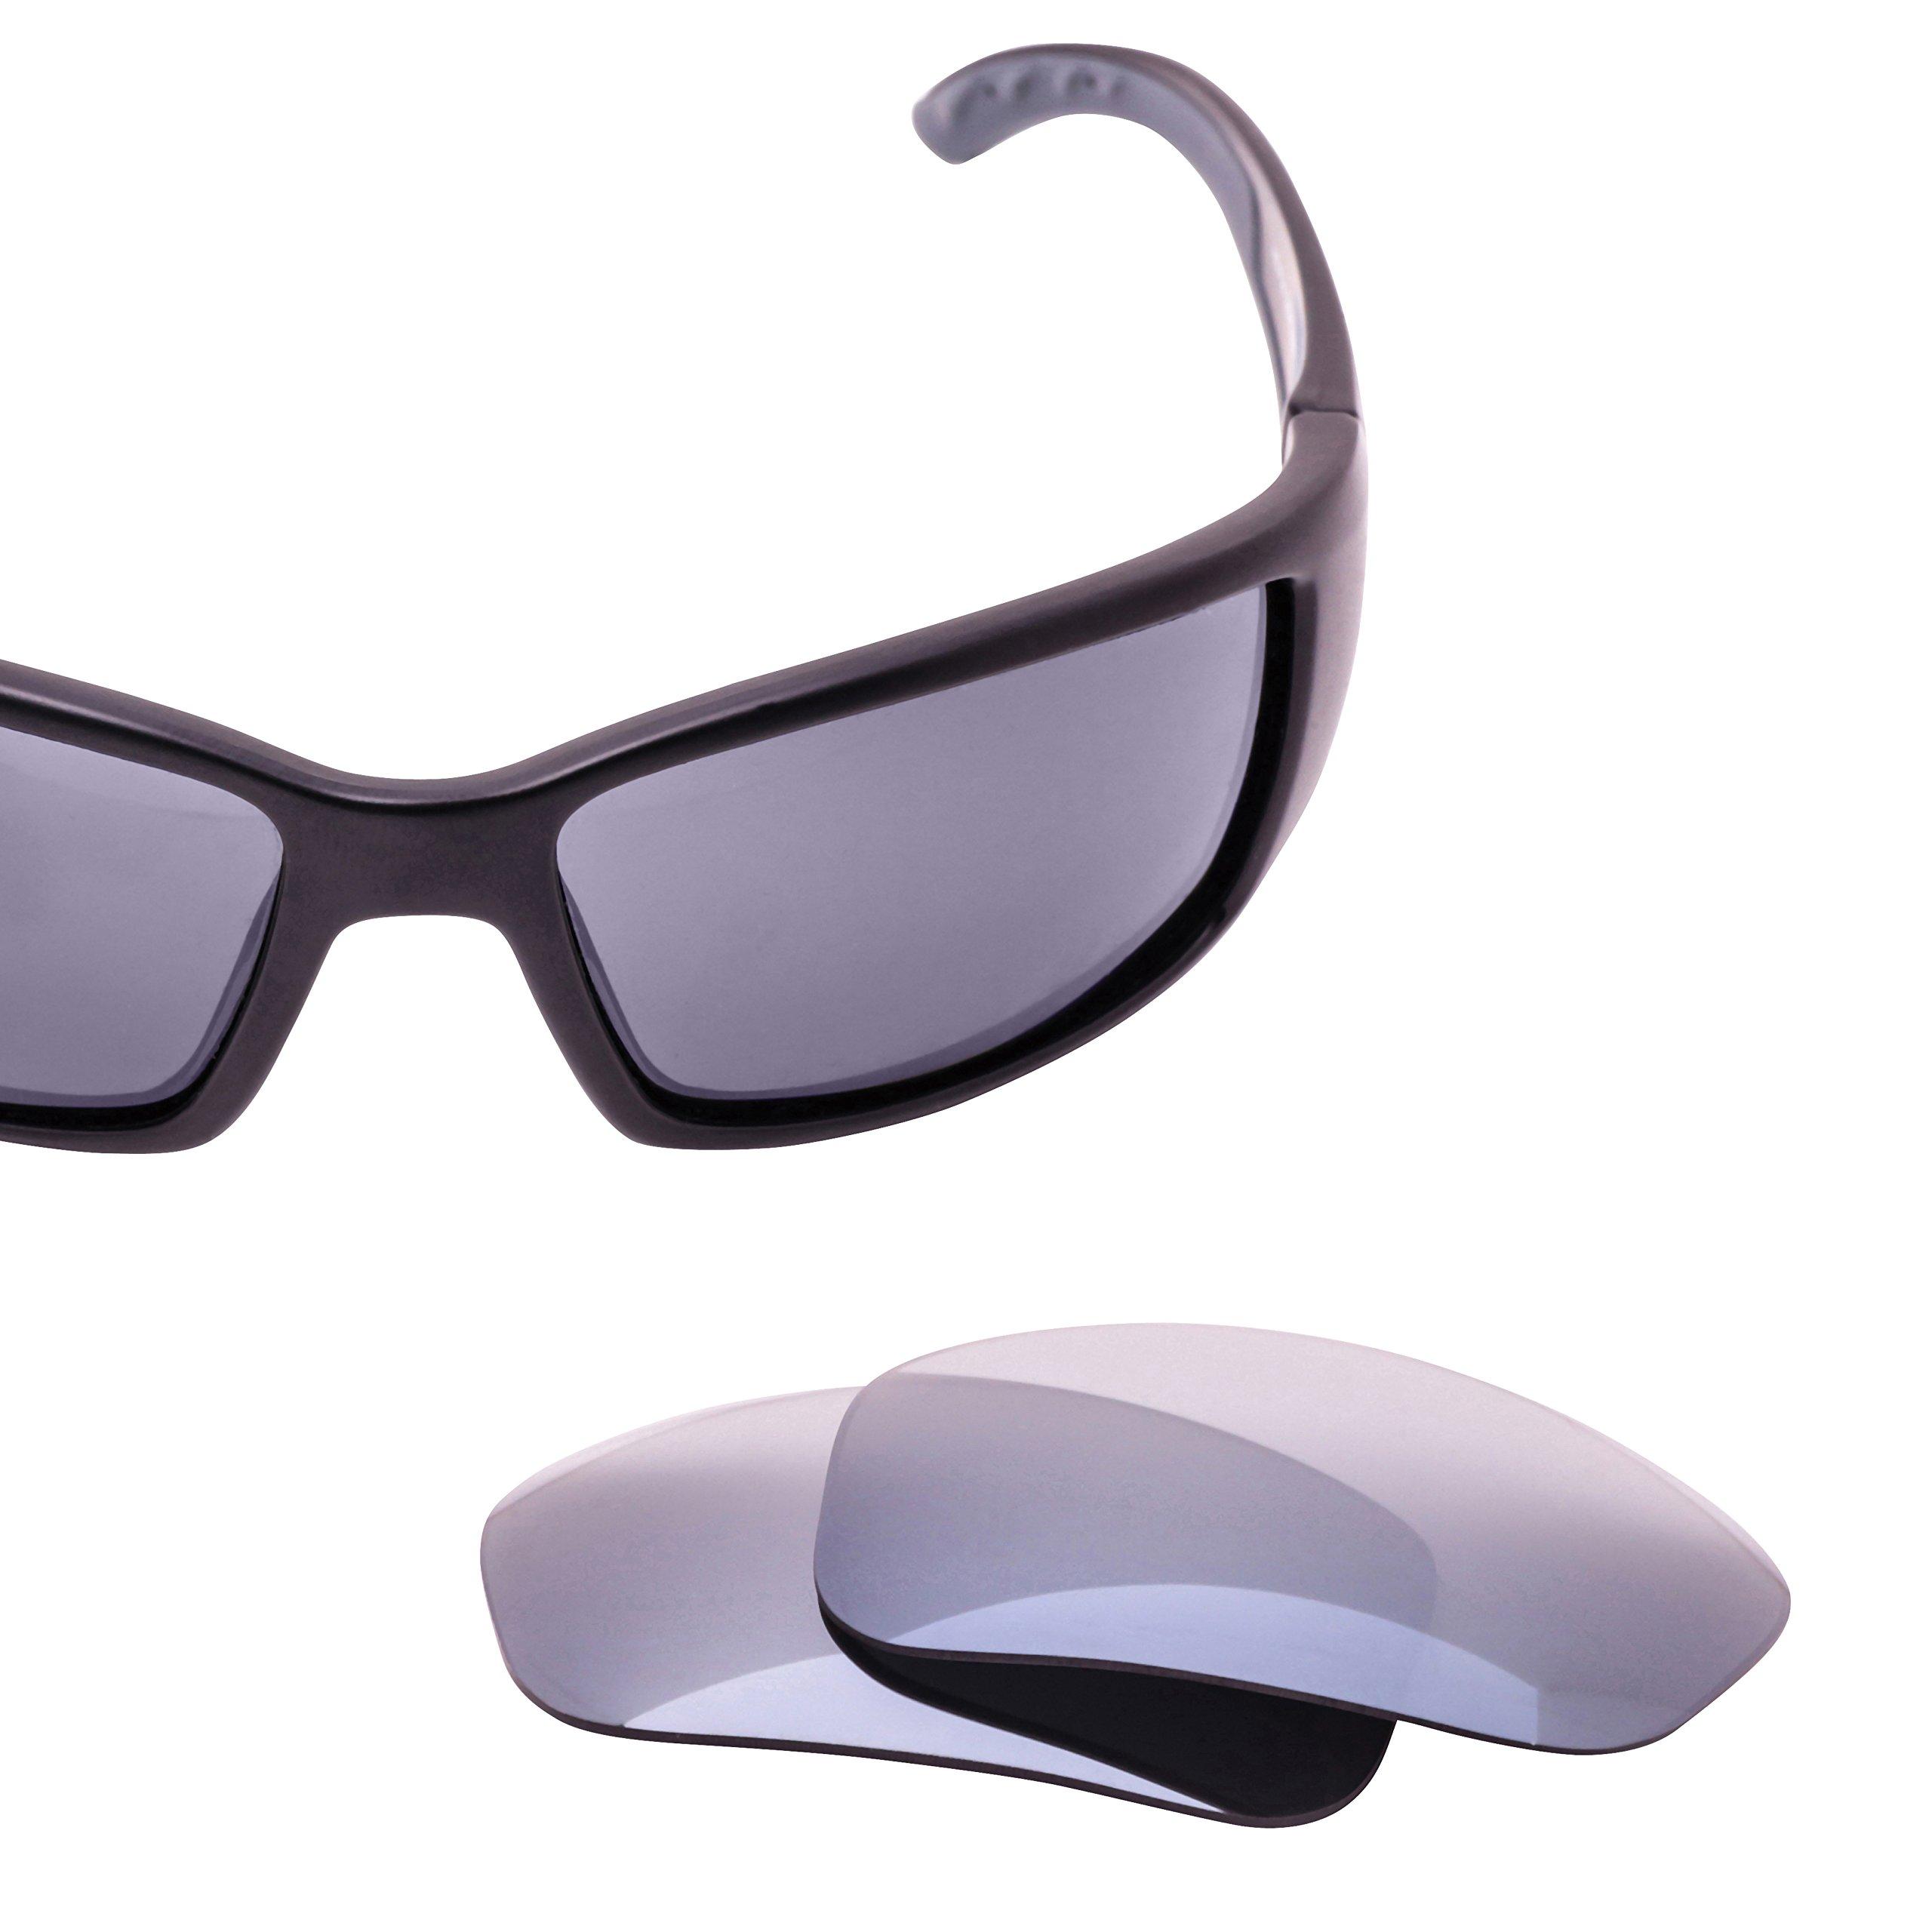 LenzFlip Replacement Lenses for Costa Del Mar BLACKFIN Sunglass- Gray Polarized with Silver Mirror Lenses